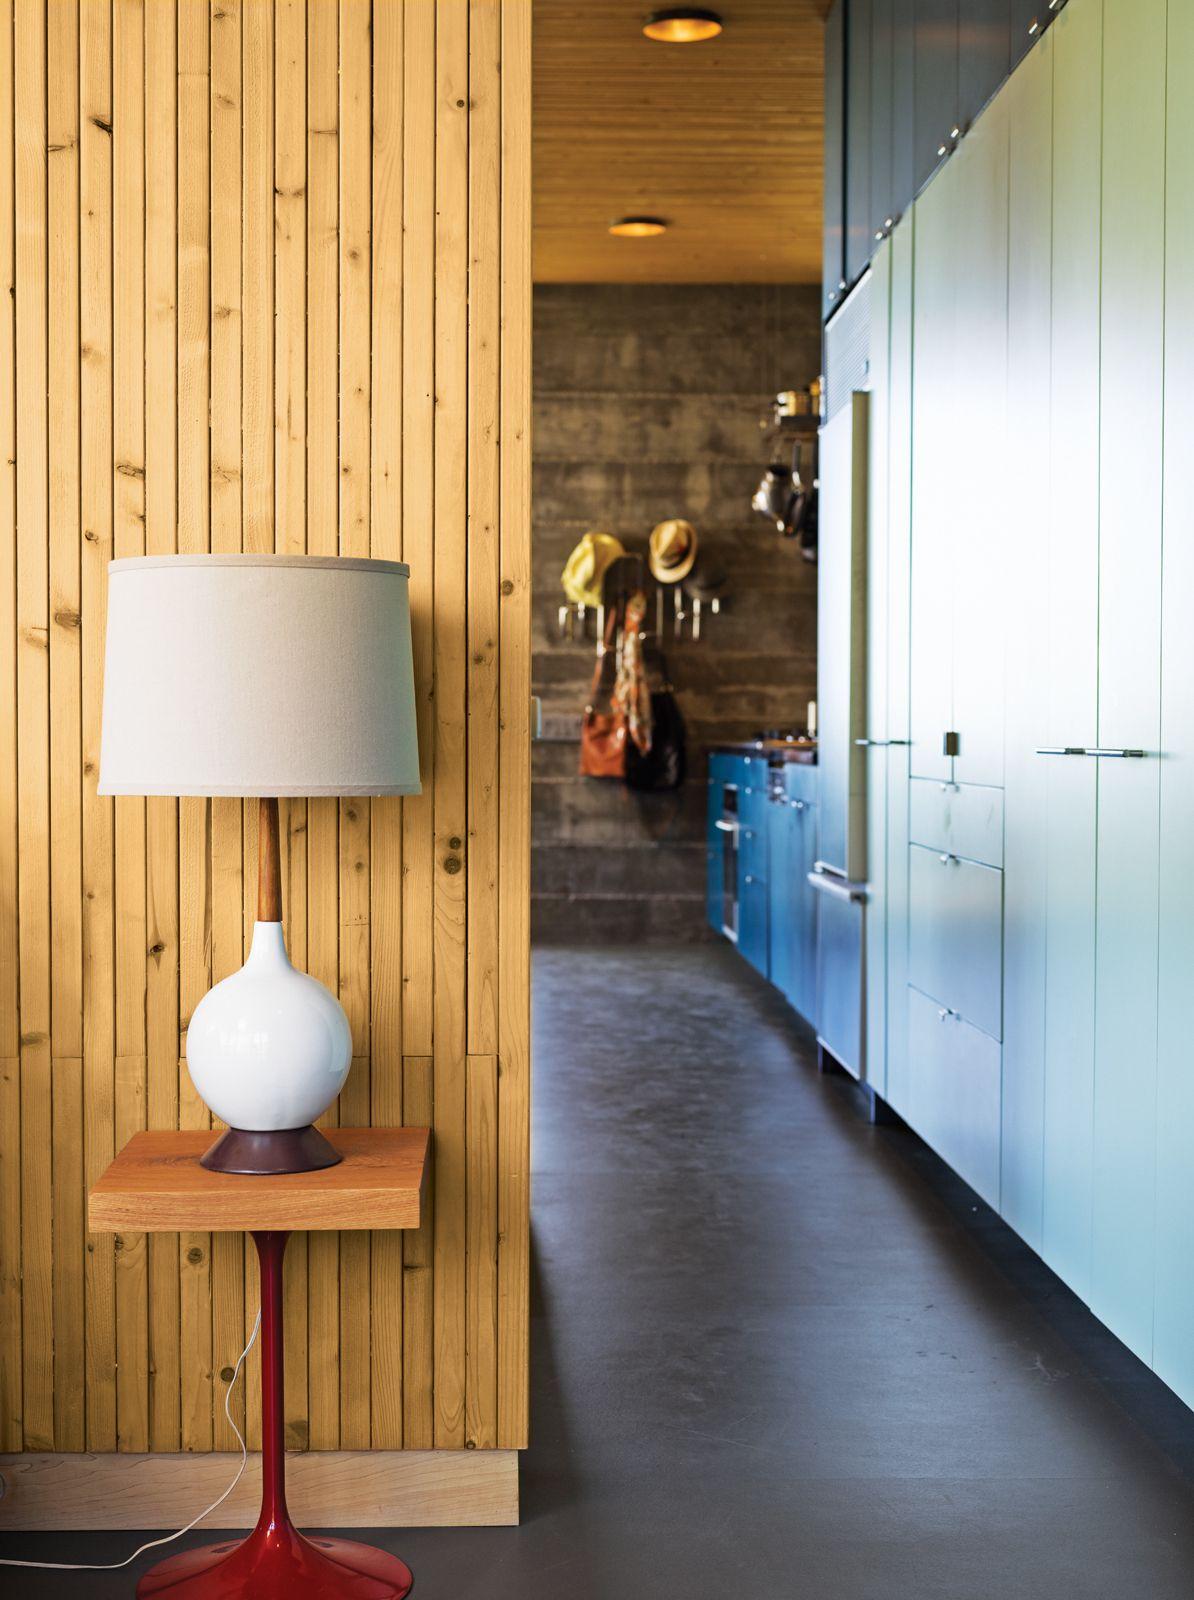 Modern kitchen hallway with wood paneled wall